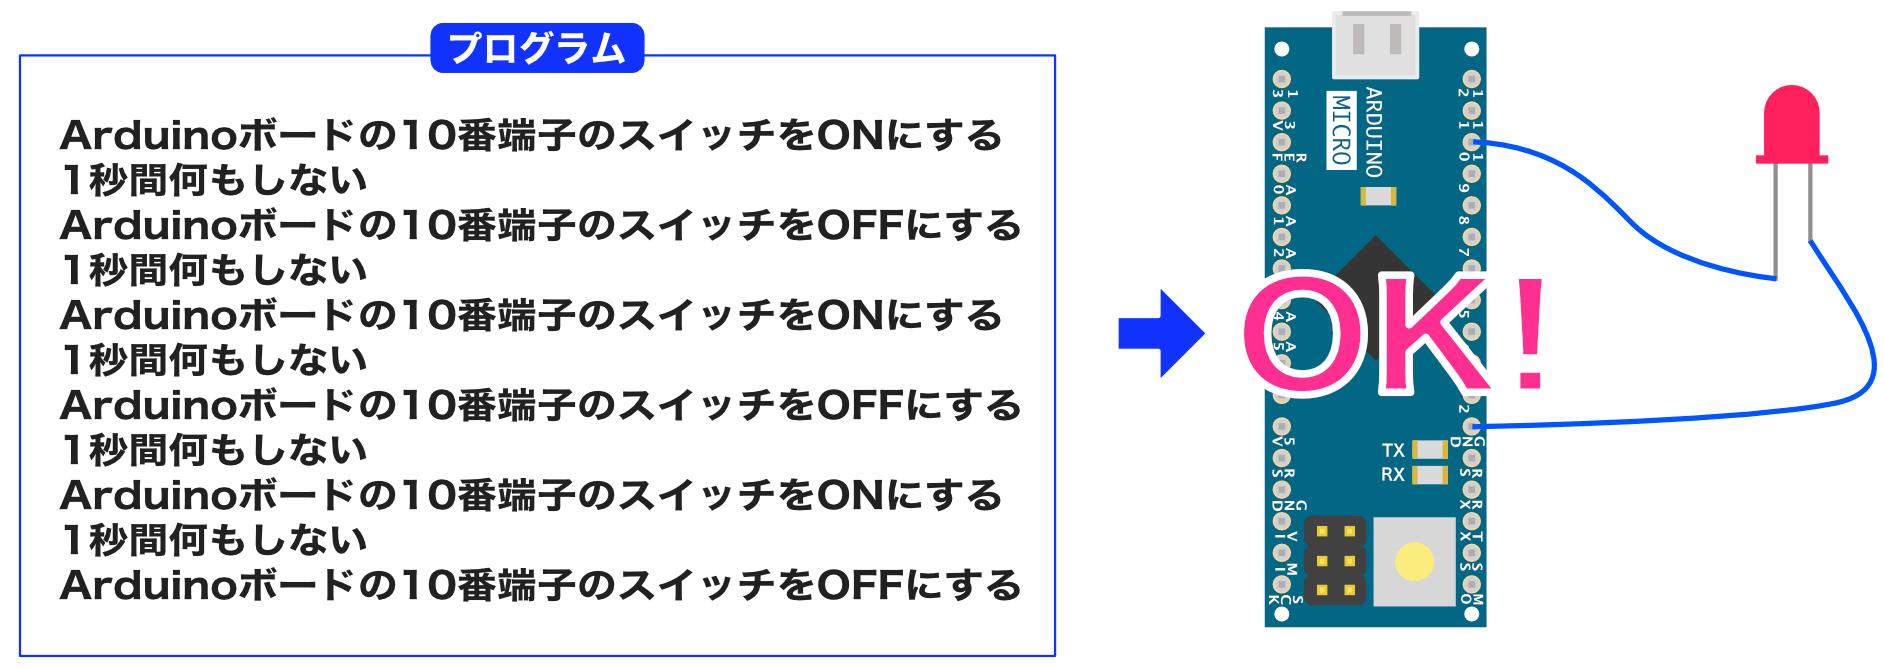 Arduinoプログラムイメージ